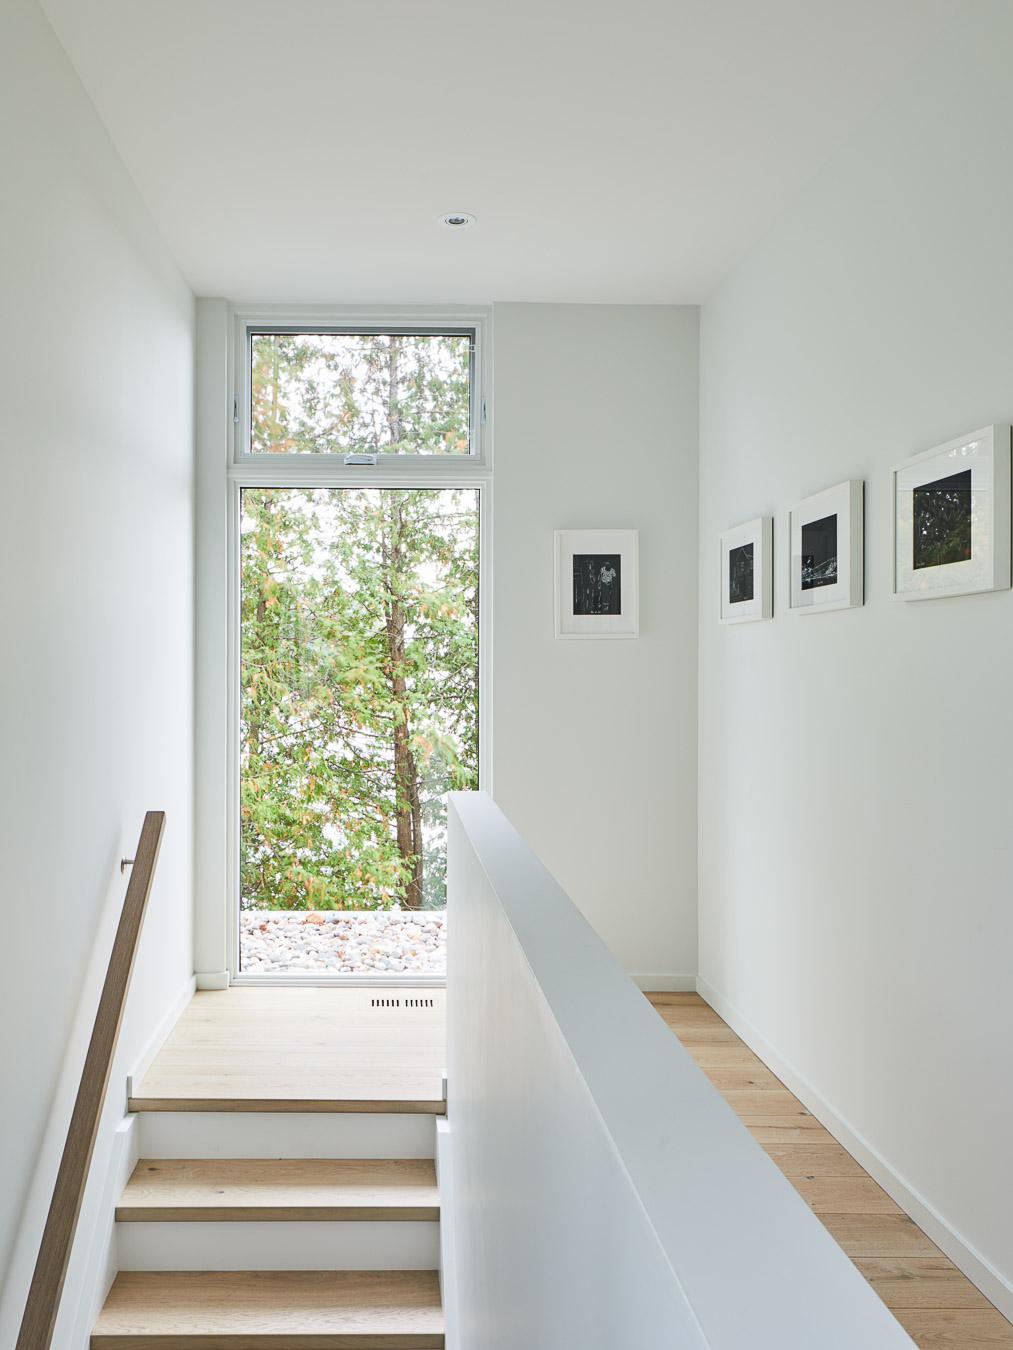 005-Shean Architects Val des Monts.jpg